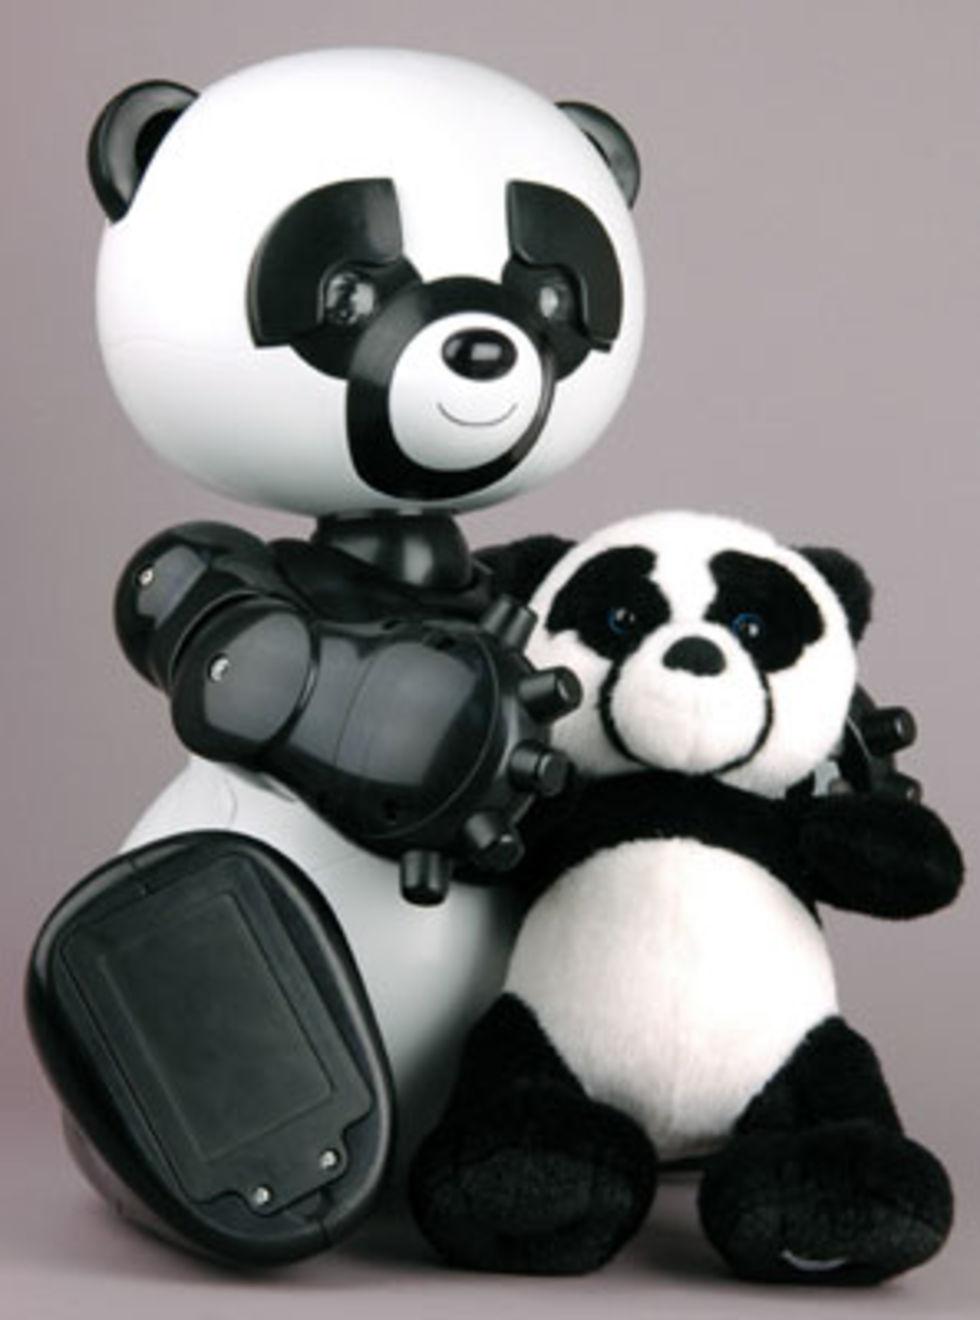 CES 2007: Pandarobot, spindelrobot och elvisrobot